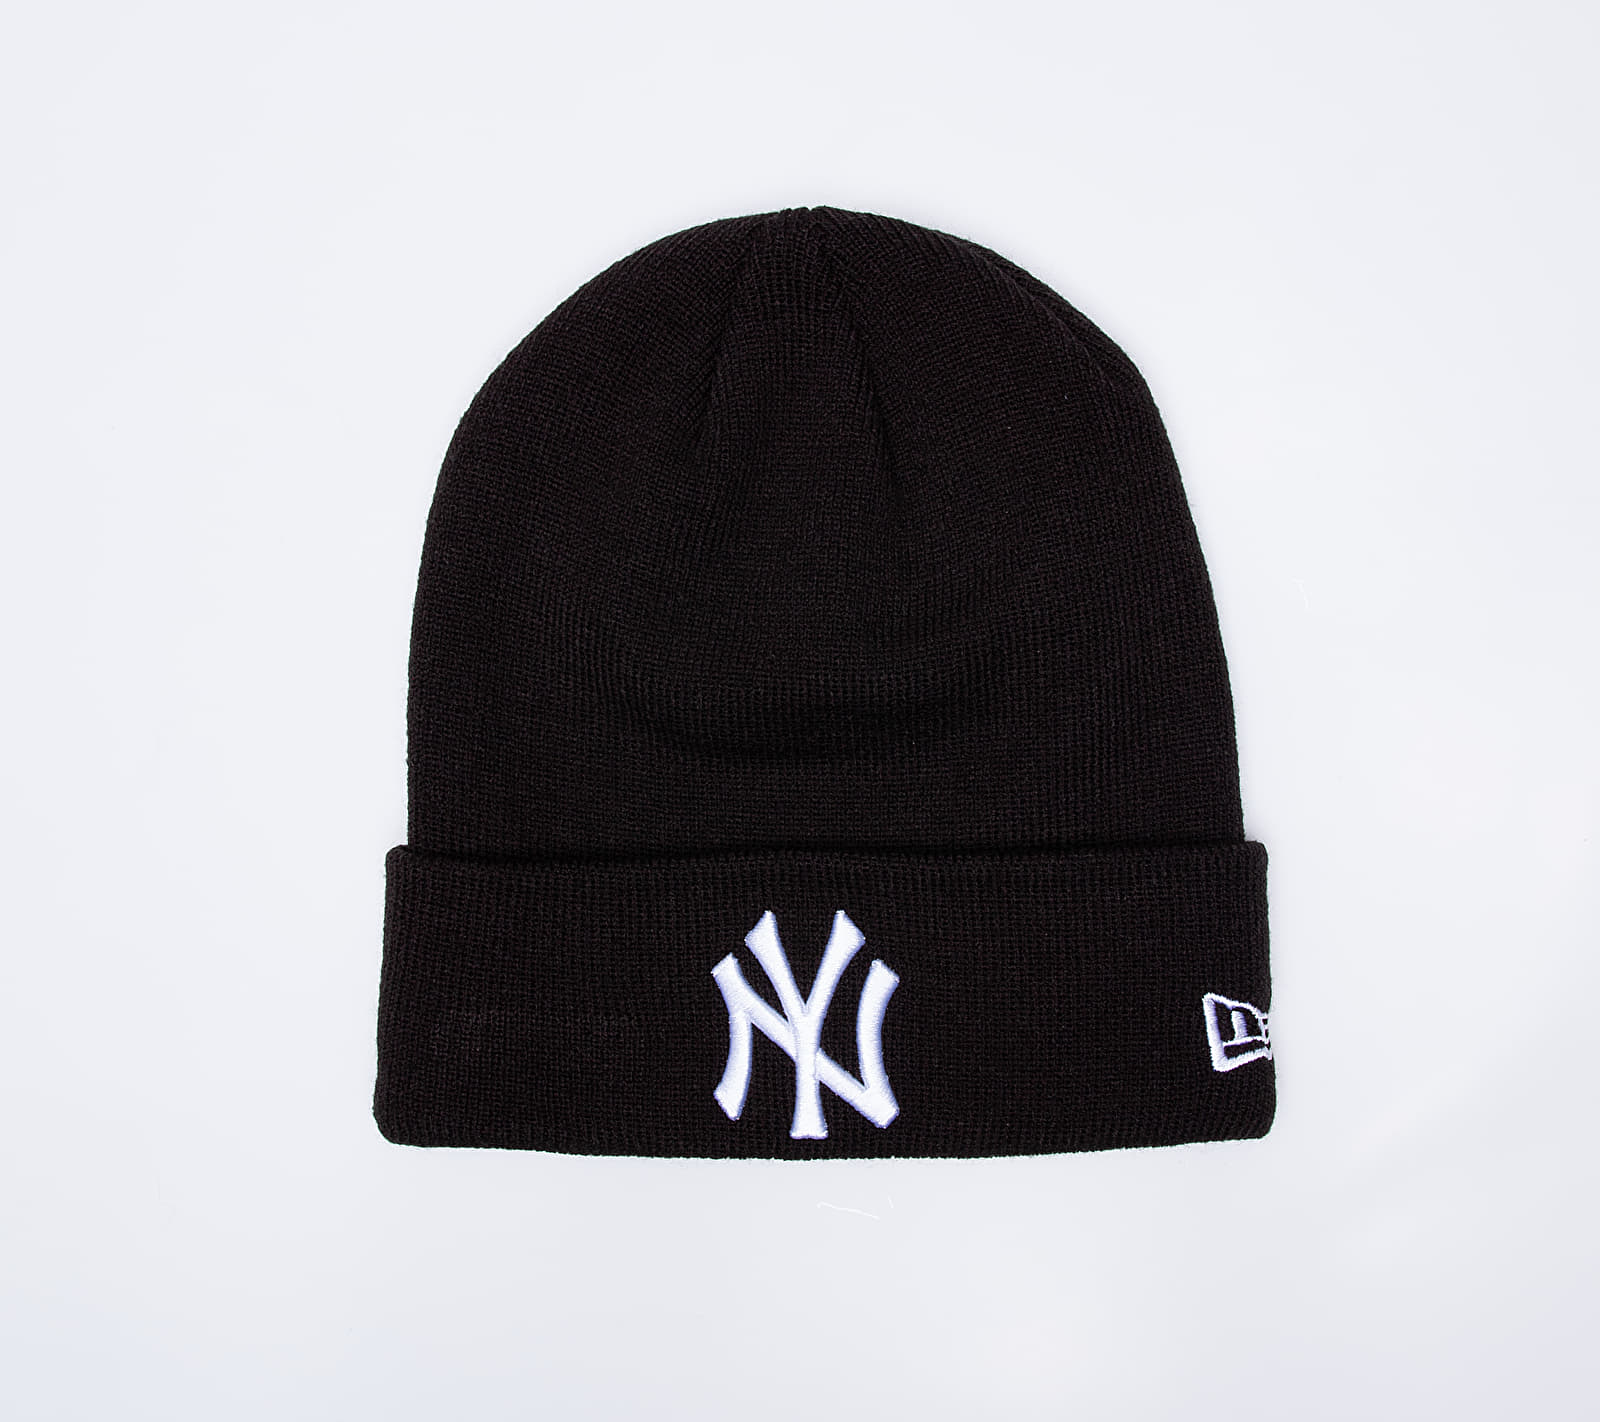 New Era MLB Essential Cuff New York Yankees Beanie Black Univerzální velikost